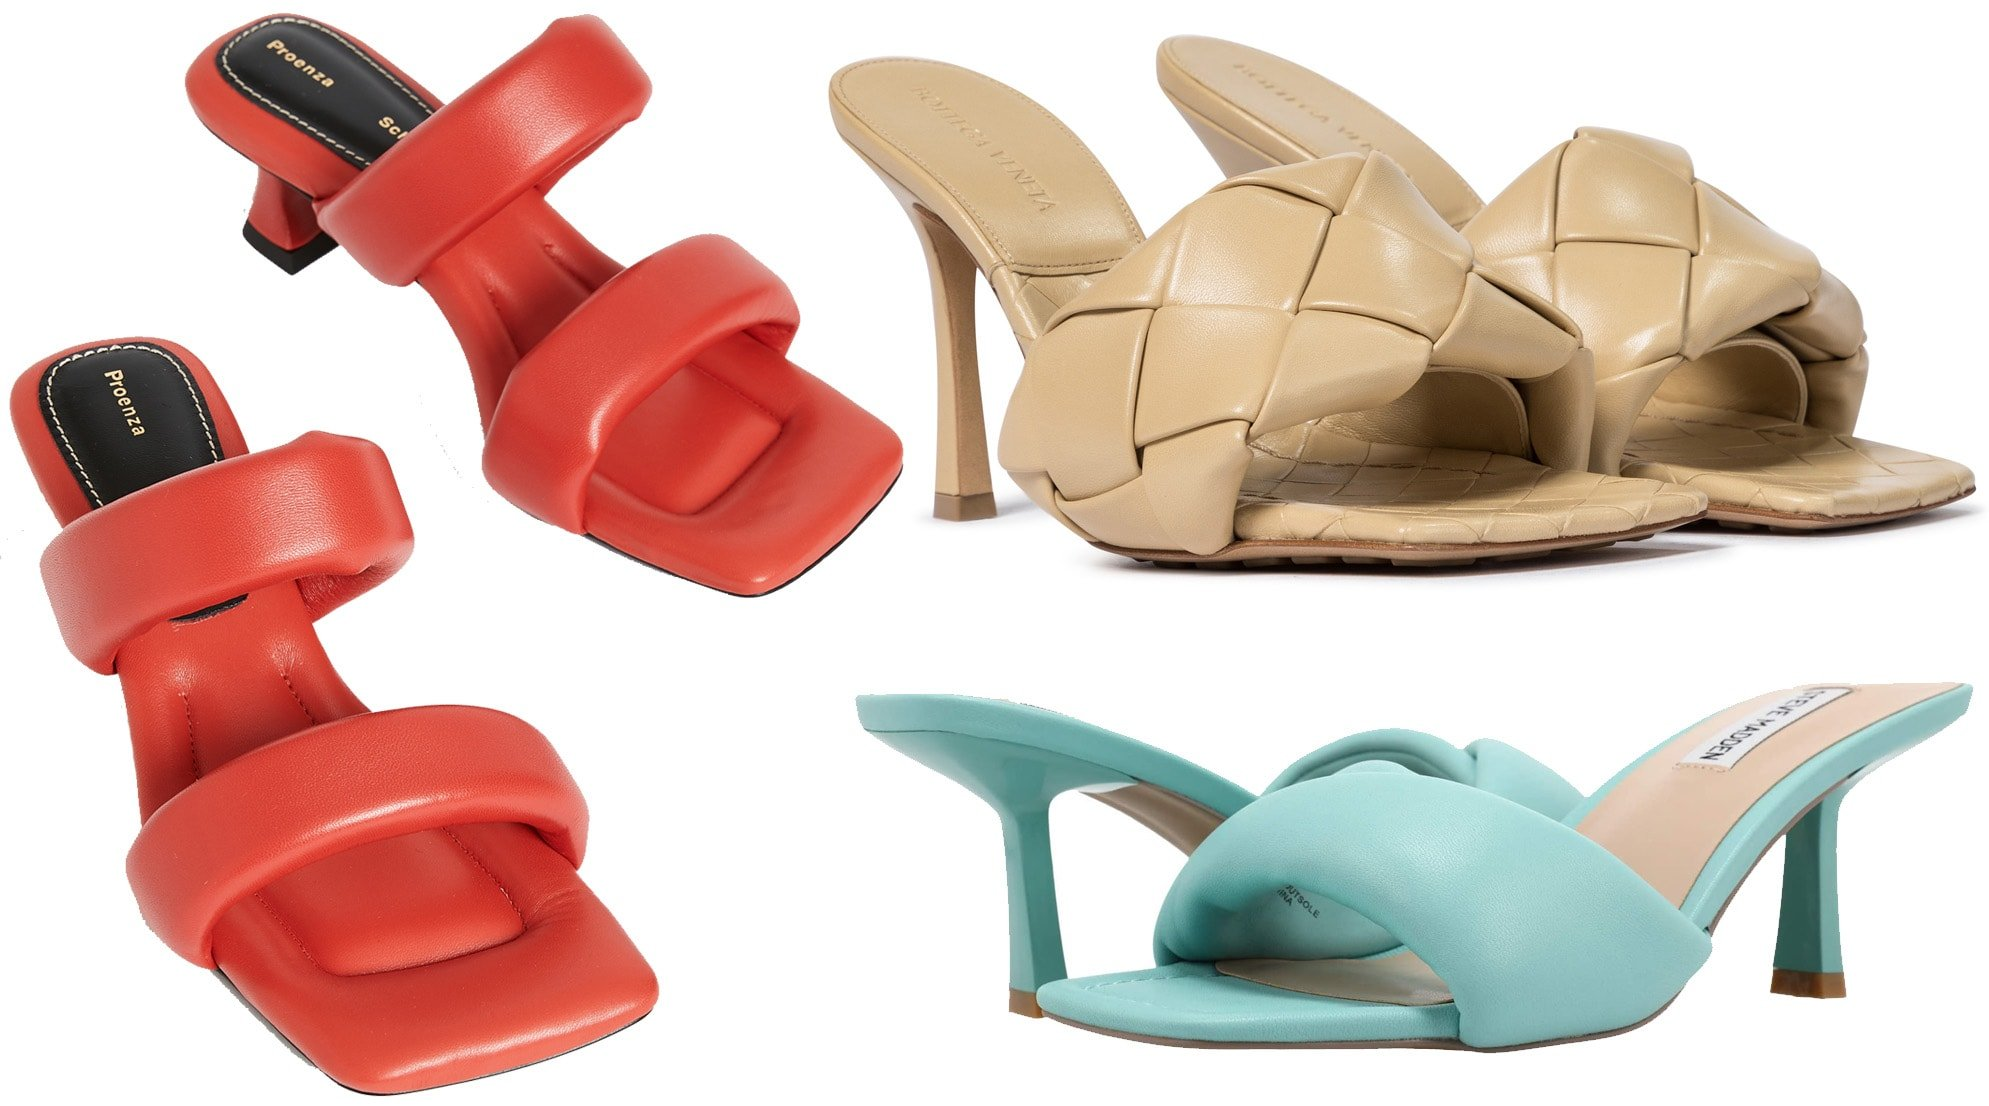 Proenza Schouler Square Toe Red Mule Sandals, Bottega Veneta BV Lido Beige Lamb Leather Sandals, Steve Madden Thai Heeled Turquoise Sandals